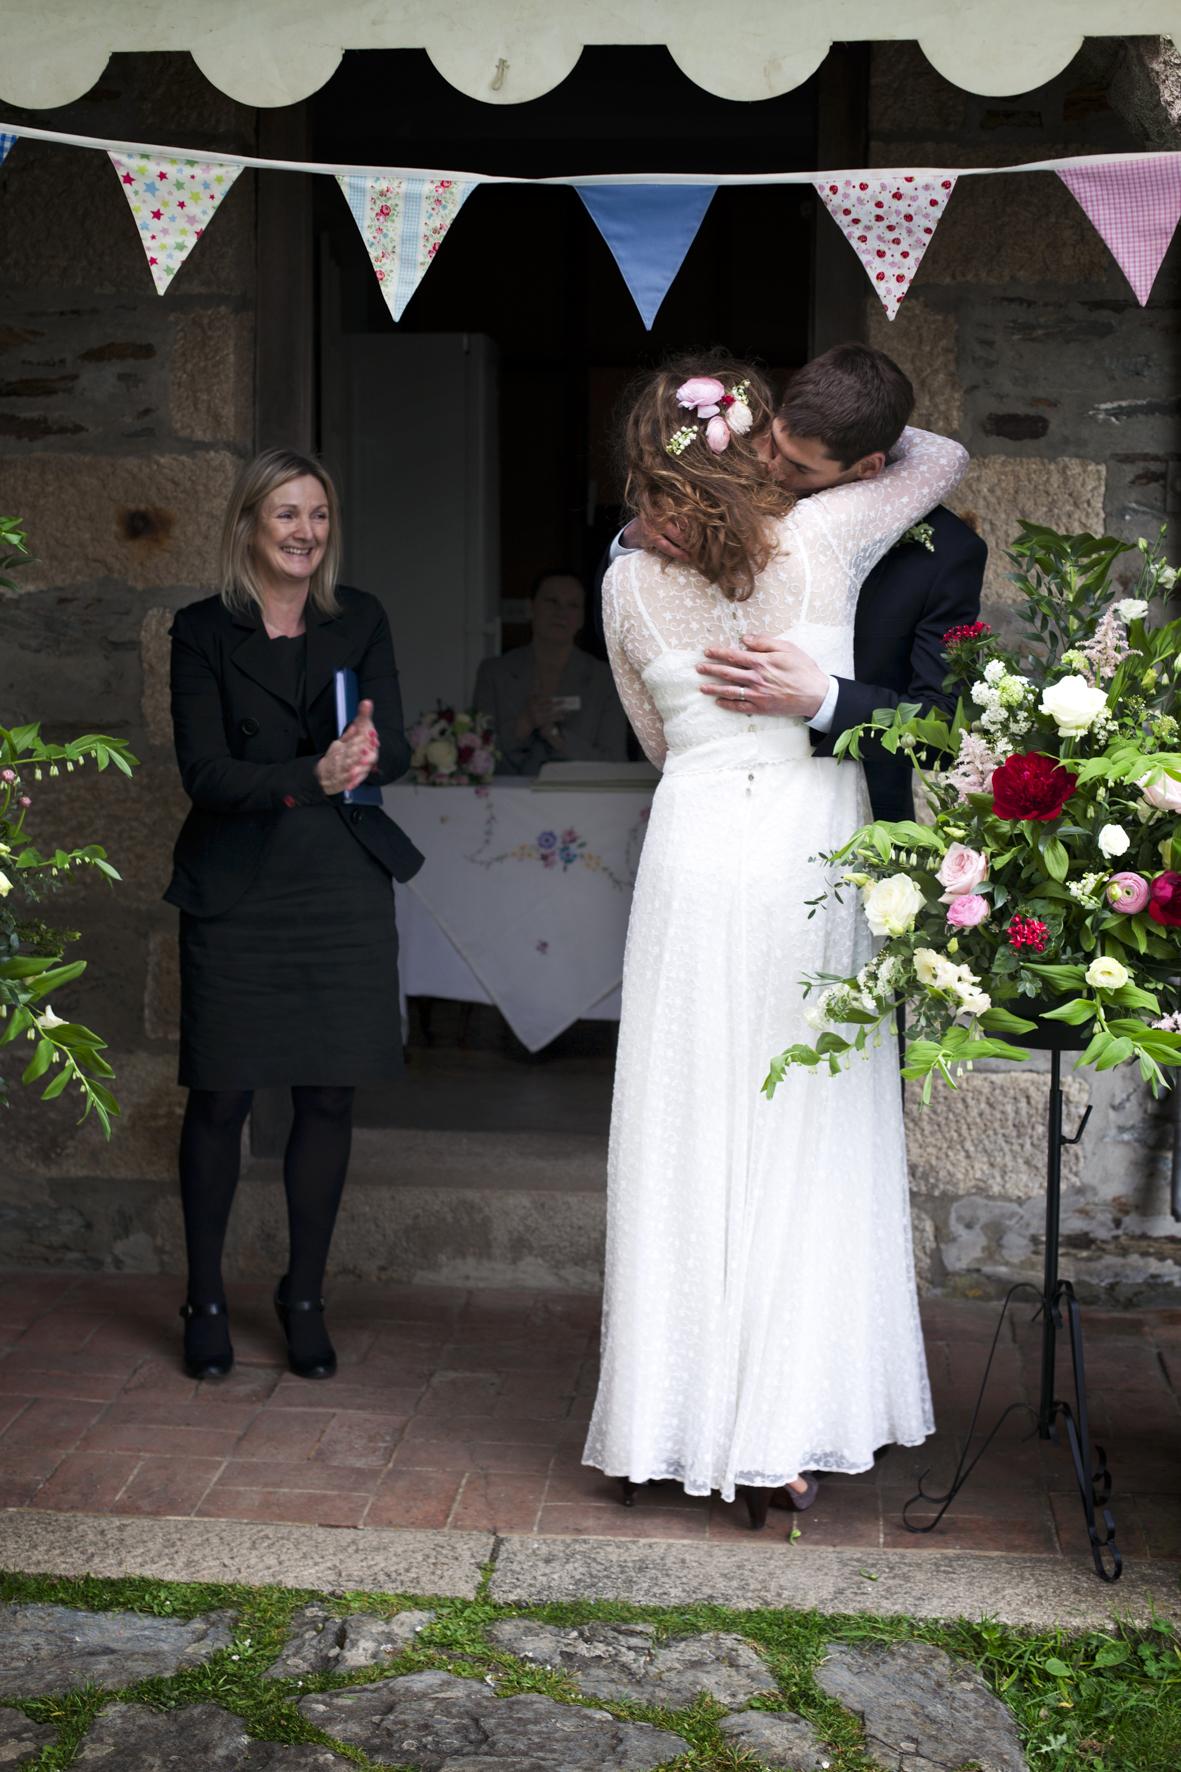 Wedding example_M&P__MG_3456-Edit_Claudia Leisinger.jpg